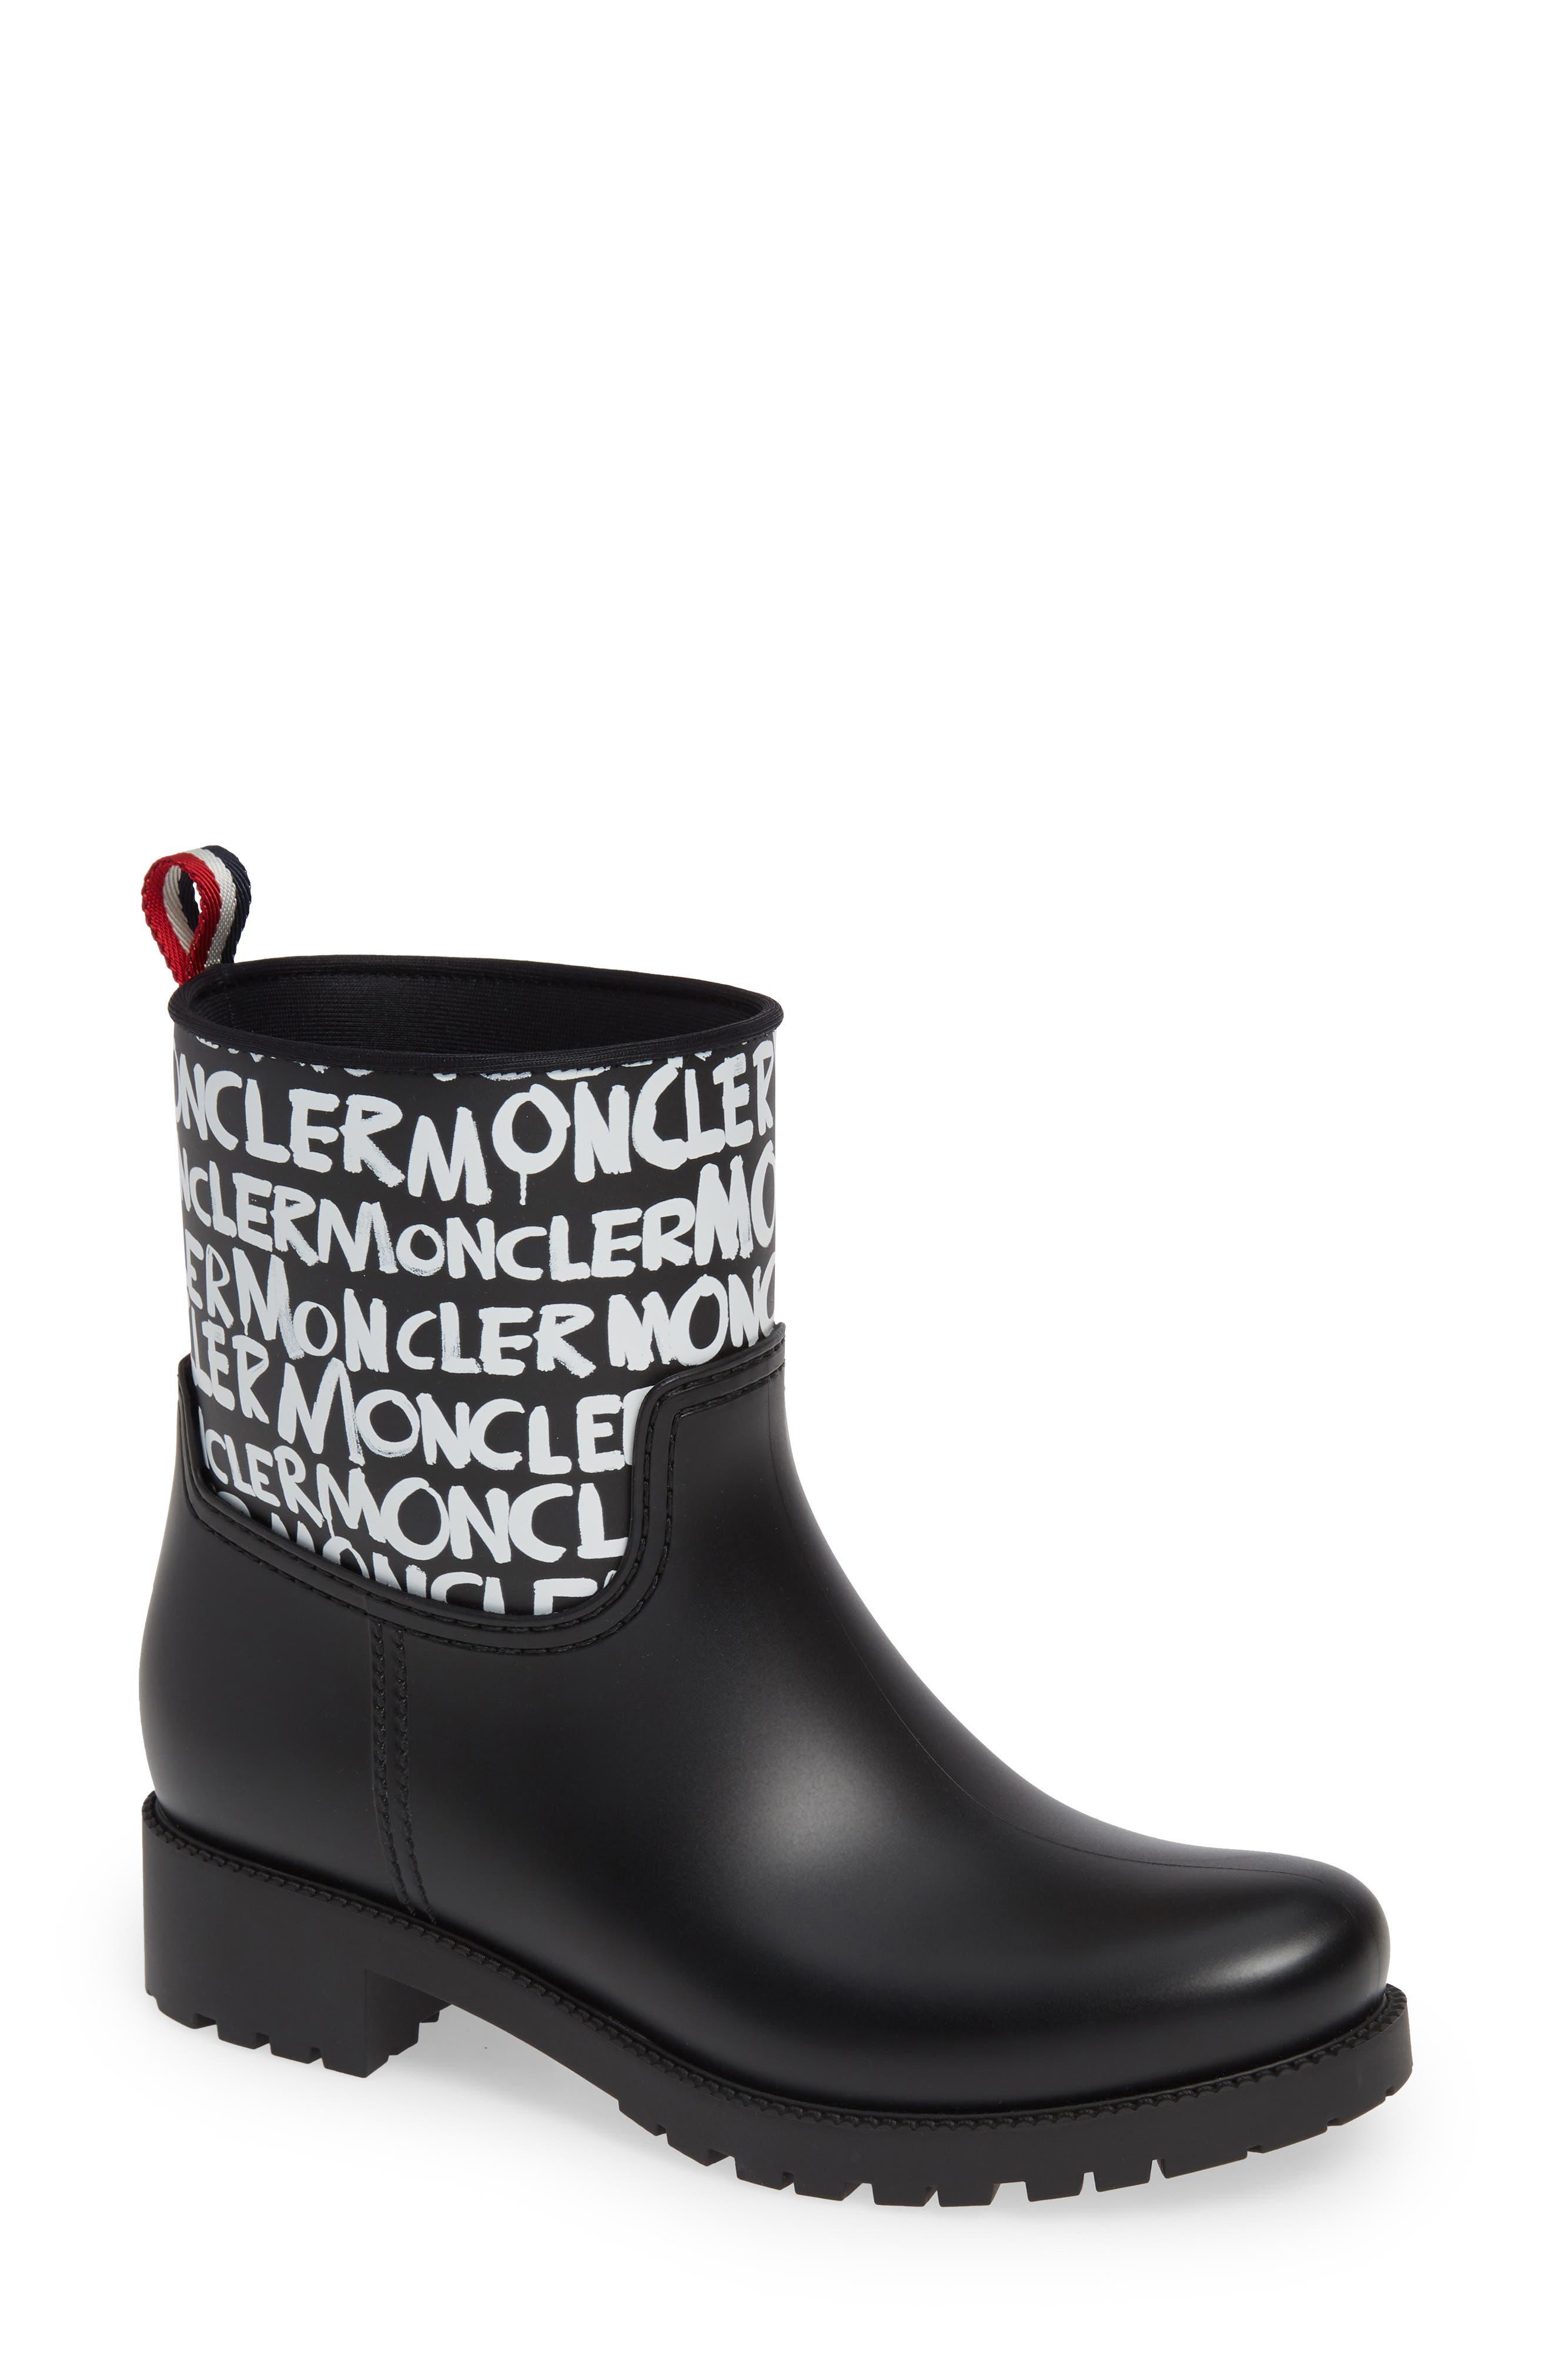 Ginette Stivale Logo Waterproof Rain Boot in Black/ White